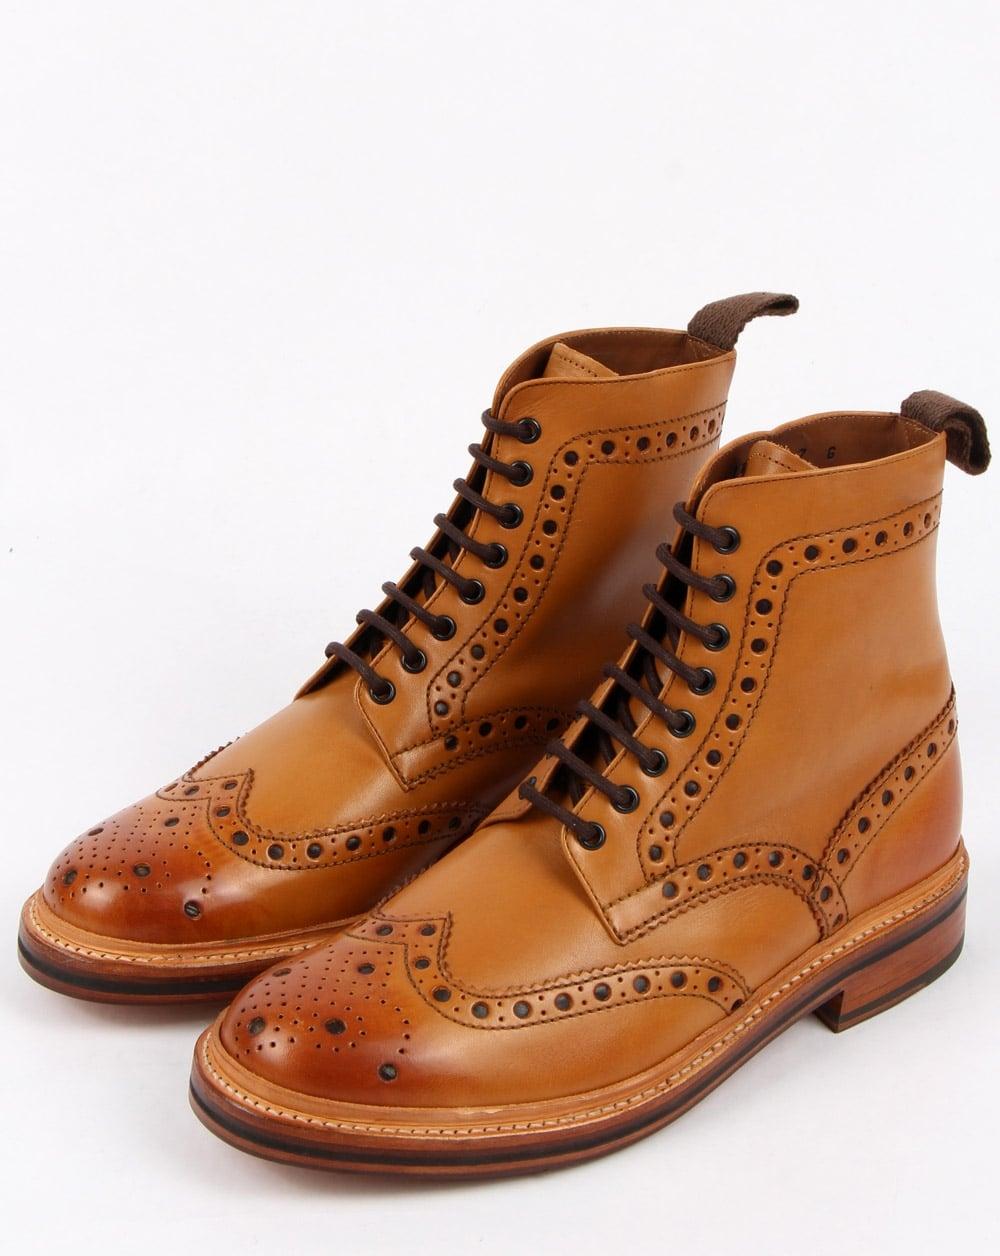 377b76ae4b2 Grenson Fred Brogue Boots Tan